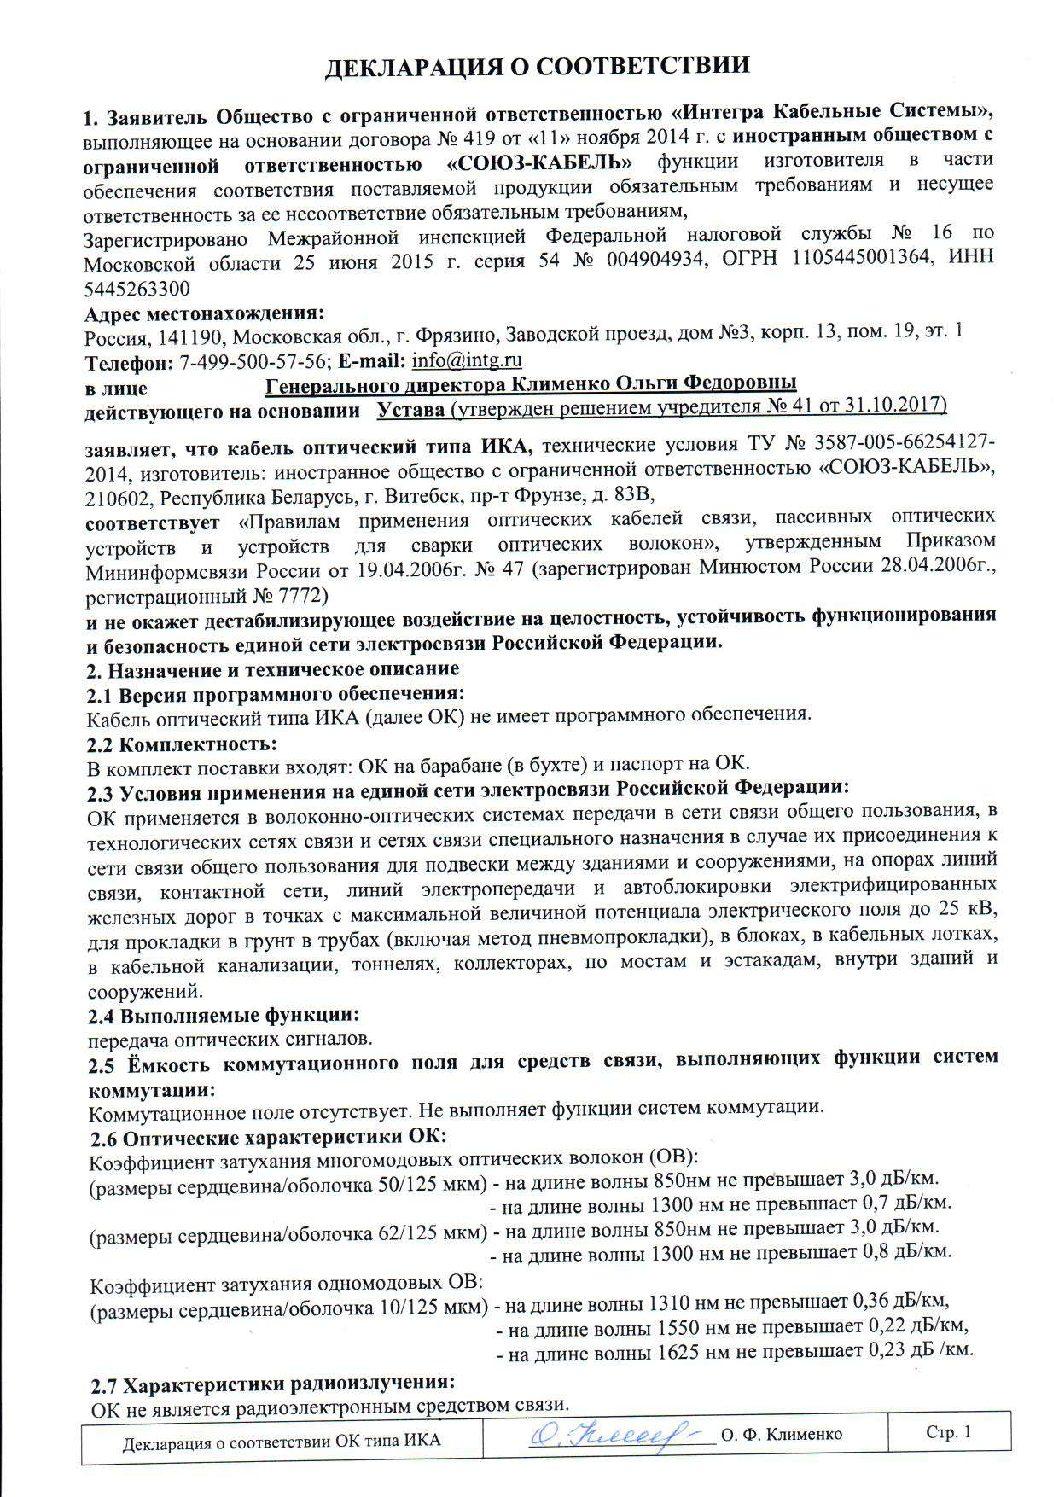 Declaration IKA